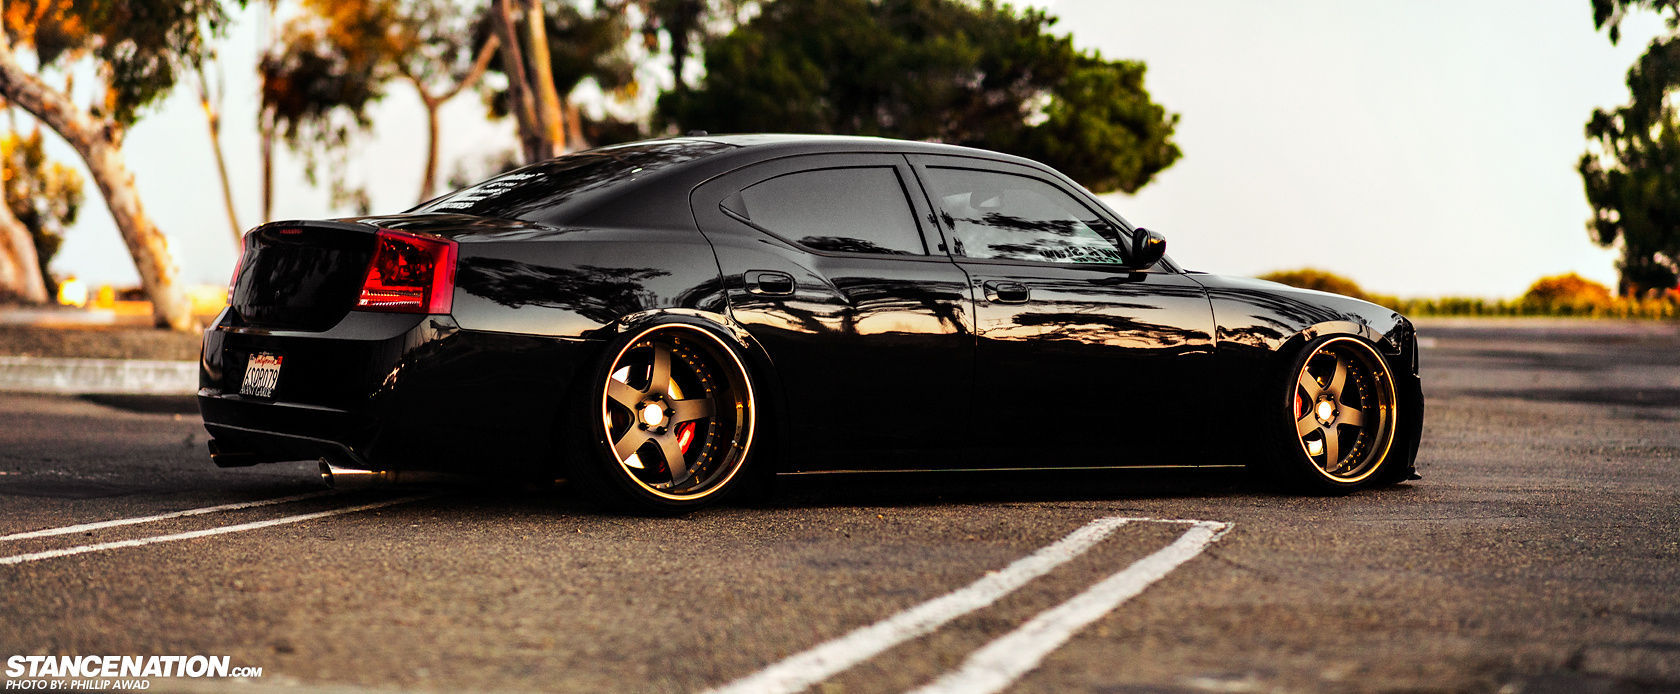 2010 Dodge Charger | Charger SRT8